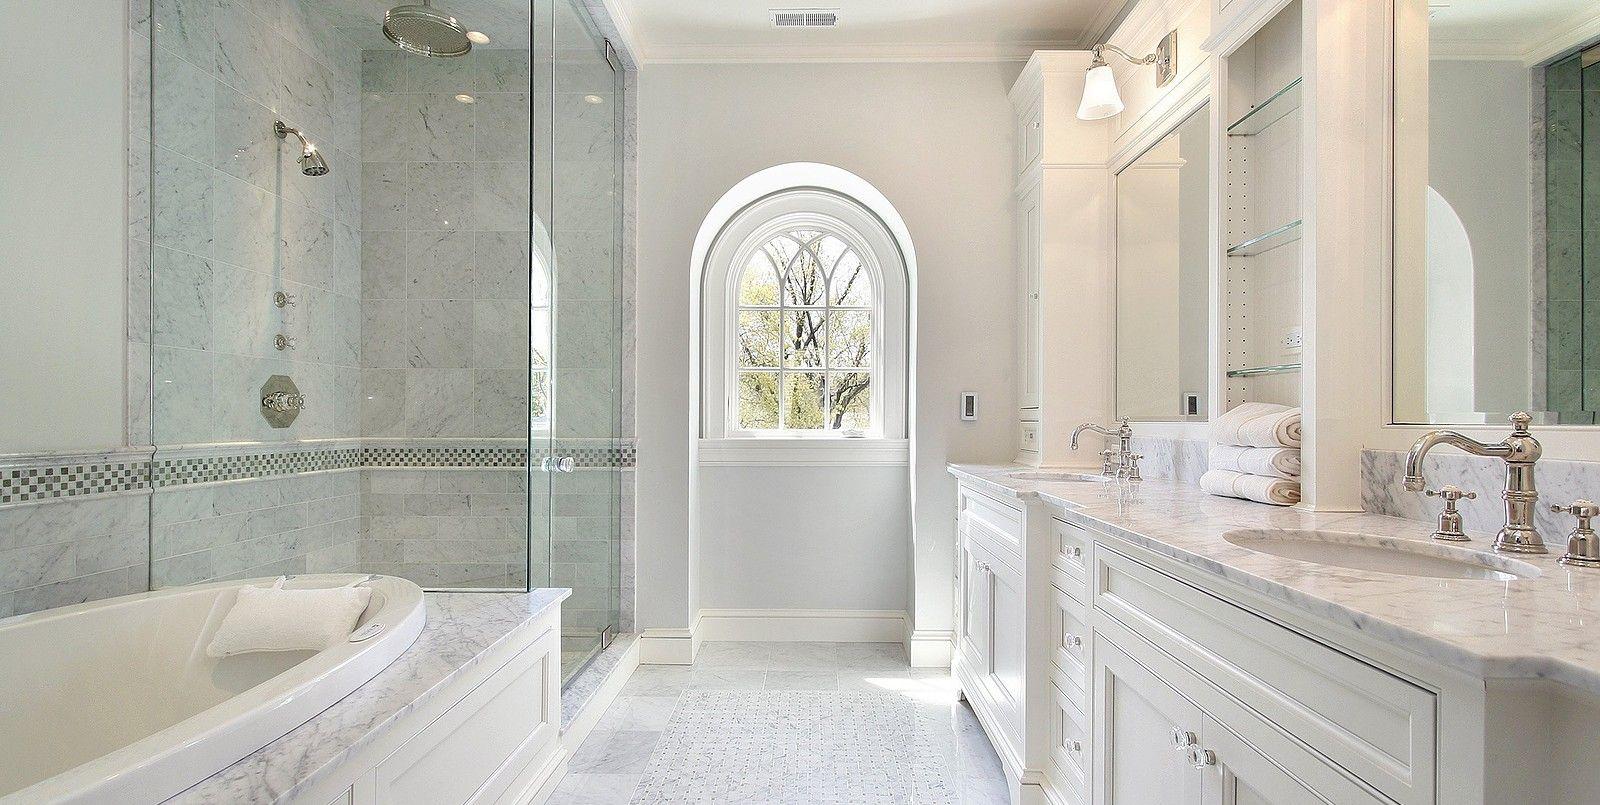 20 High End Luxurious Modern Master Bathrooms Interior Do